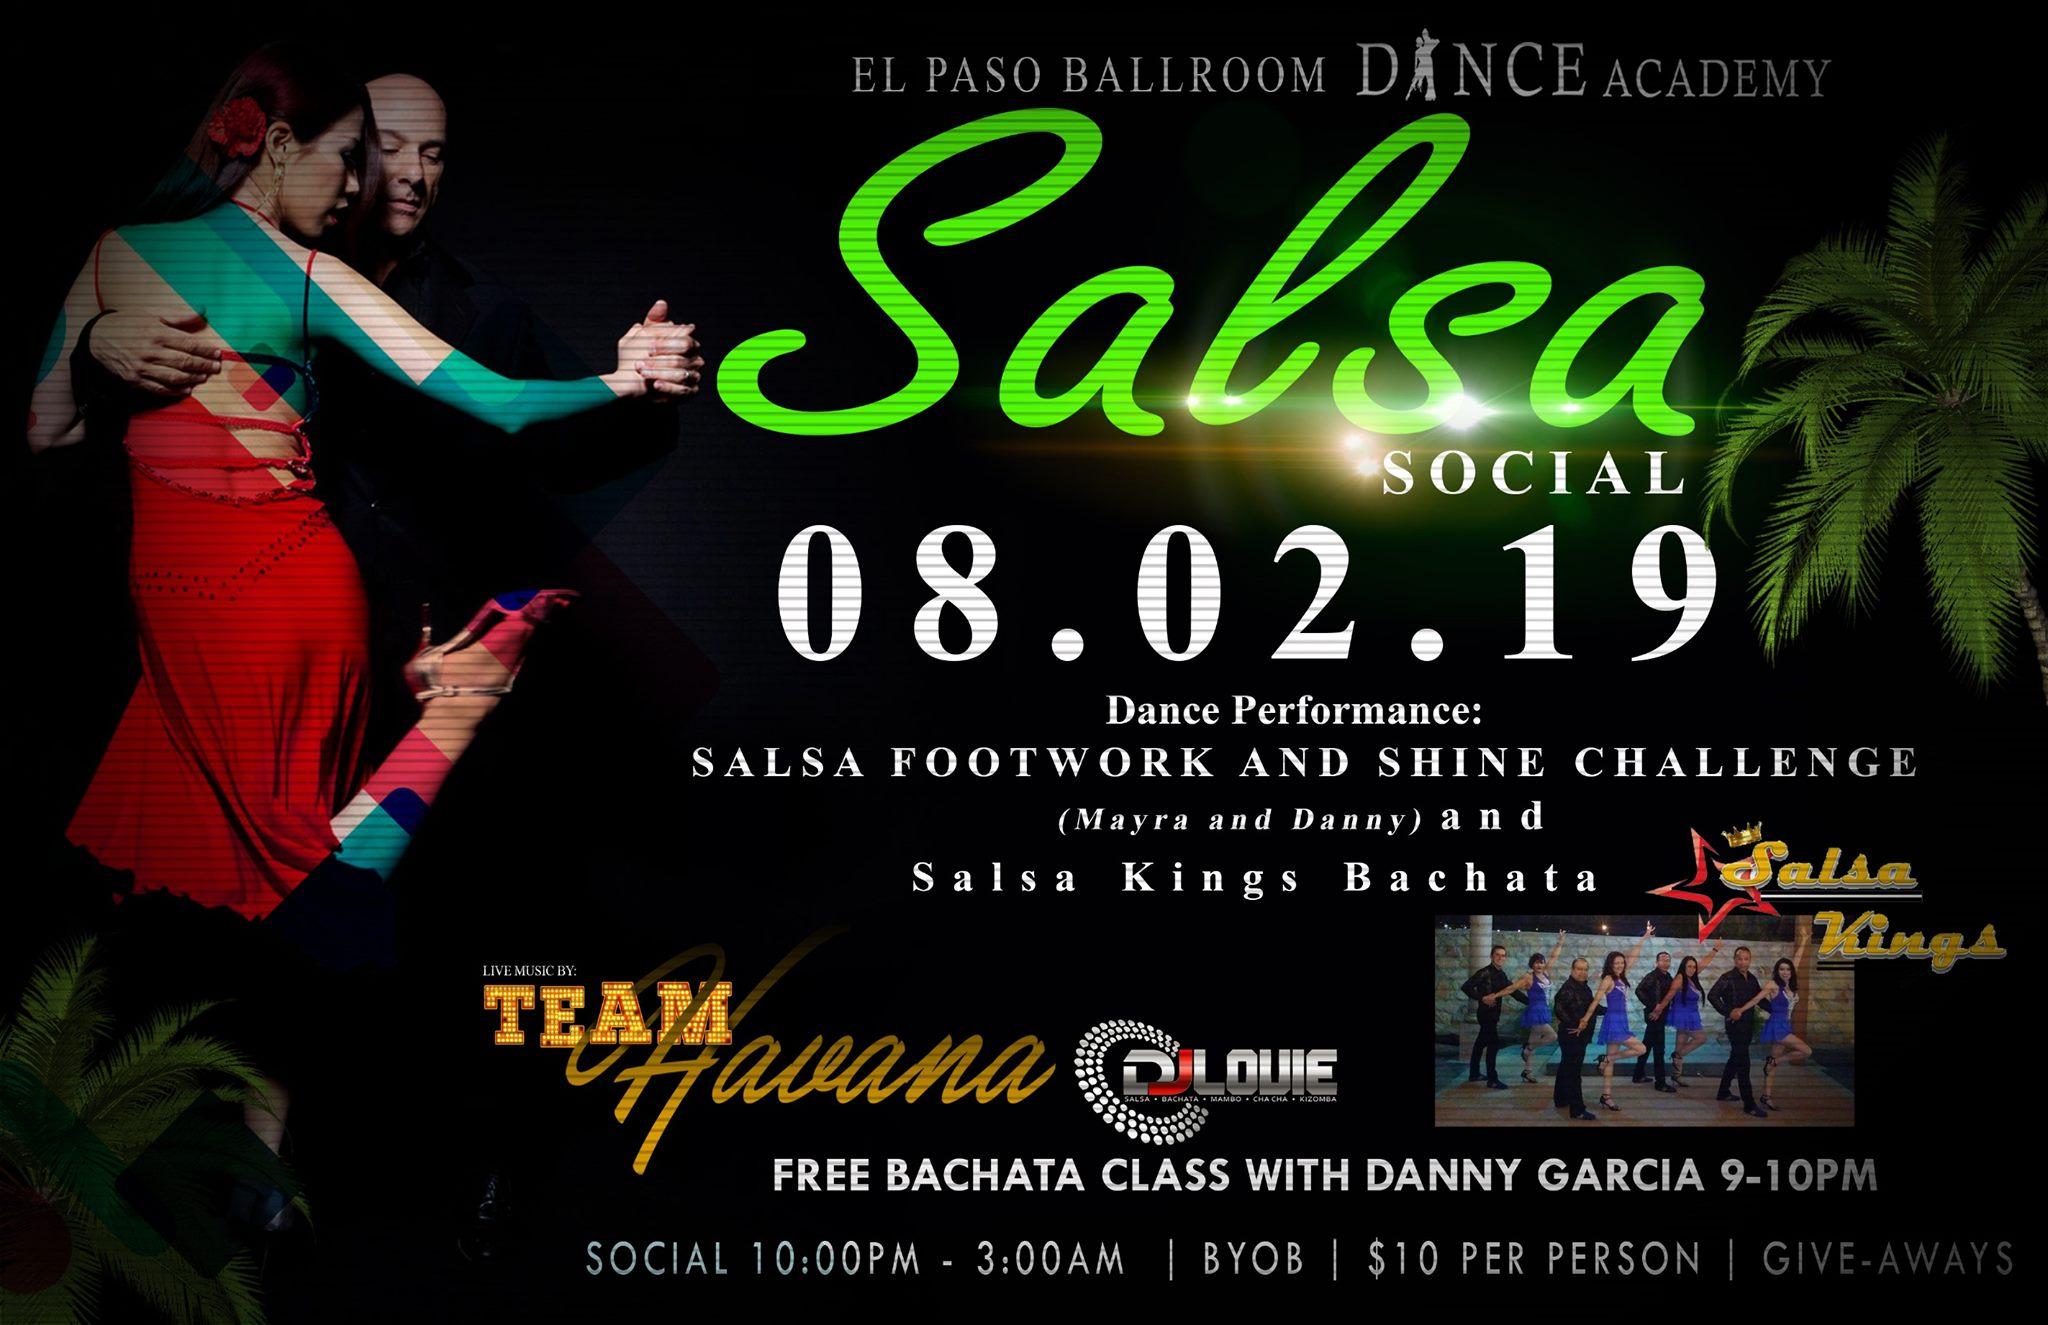 salsa-social-august-2-2019-epbda